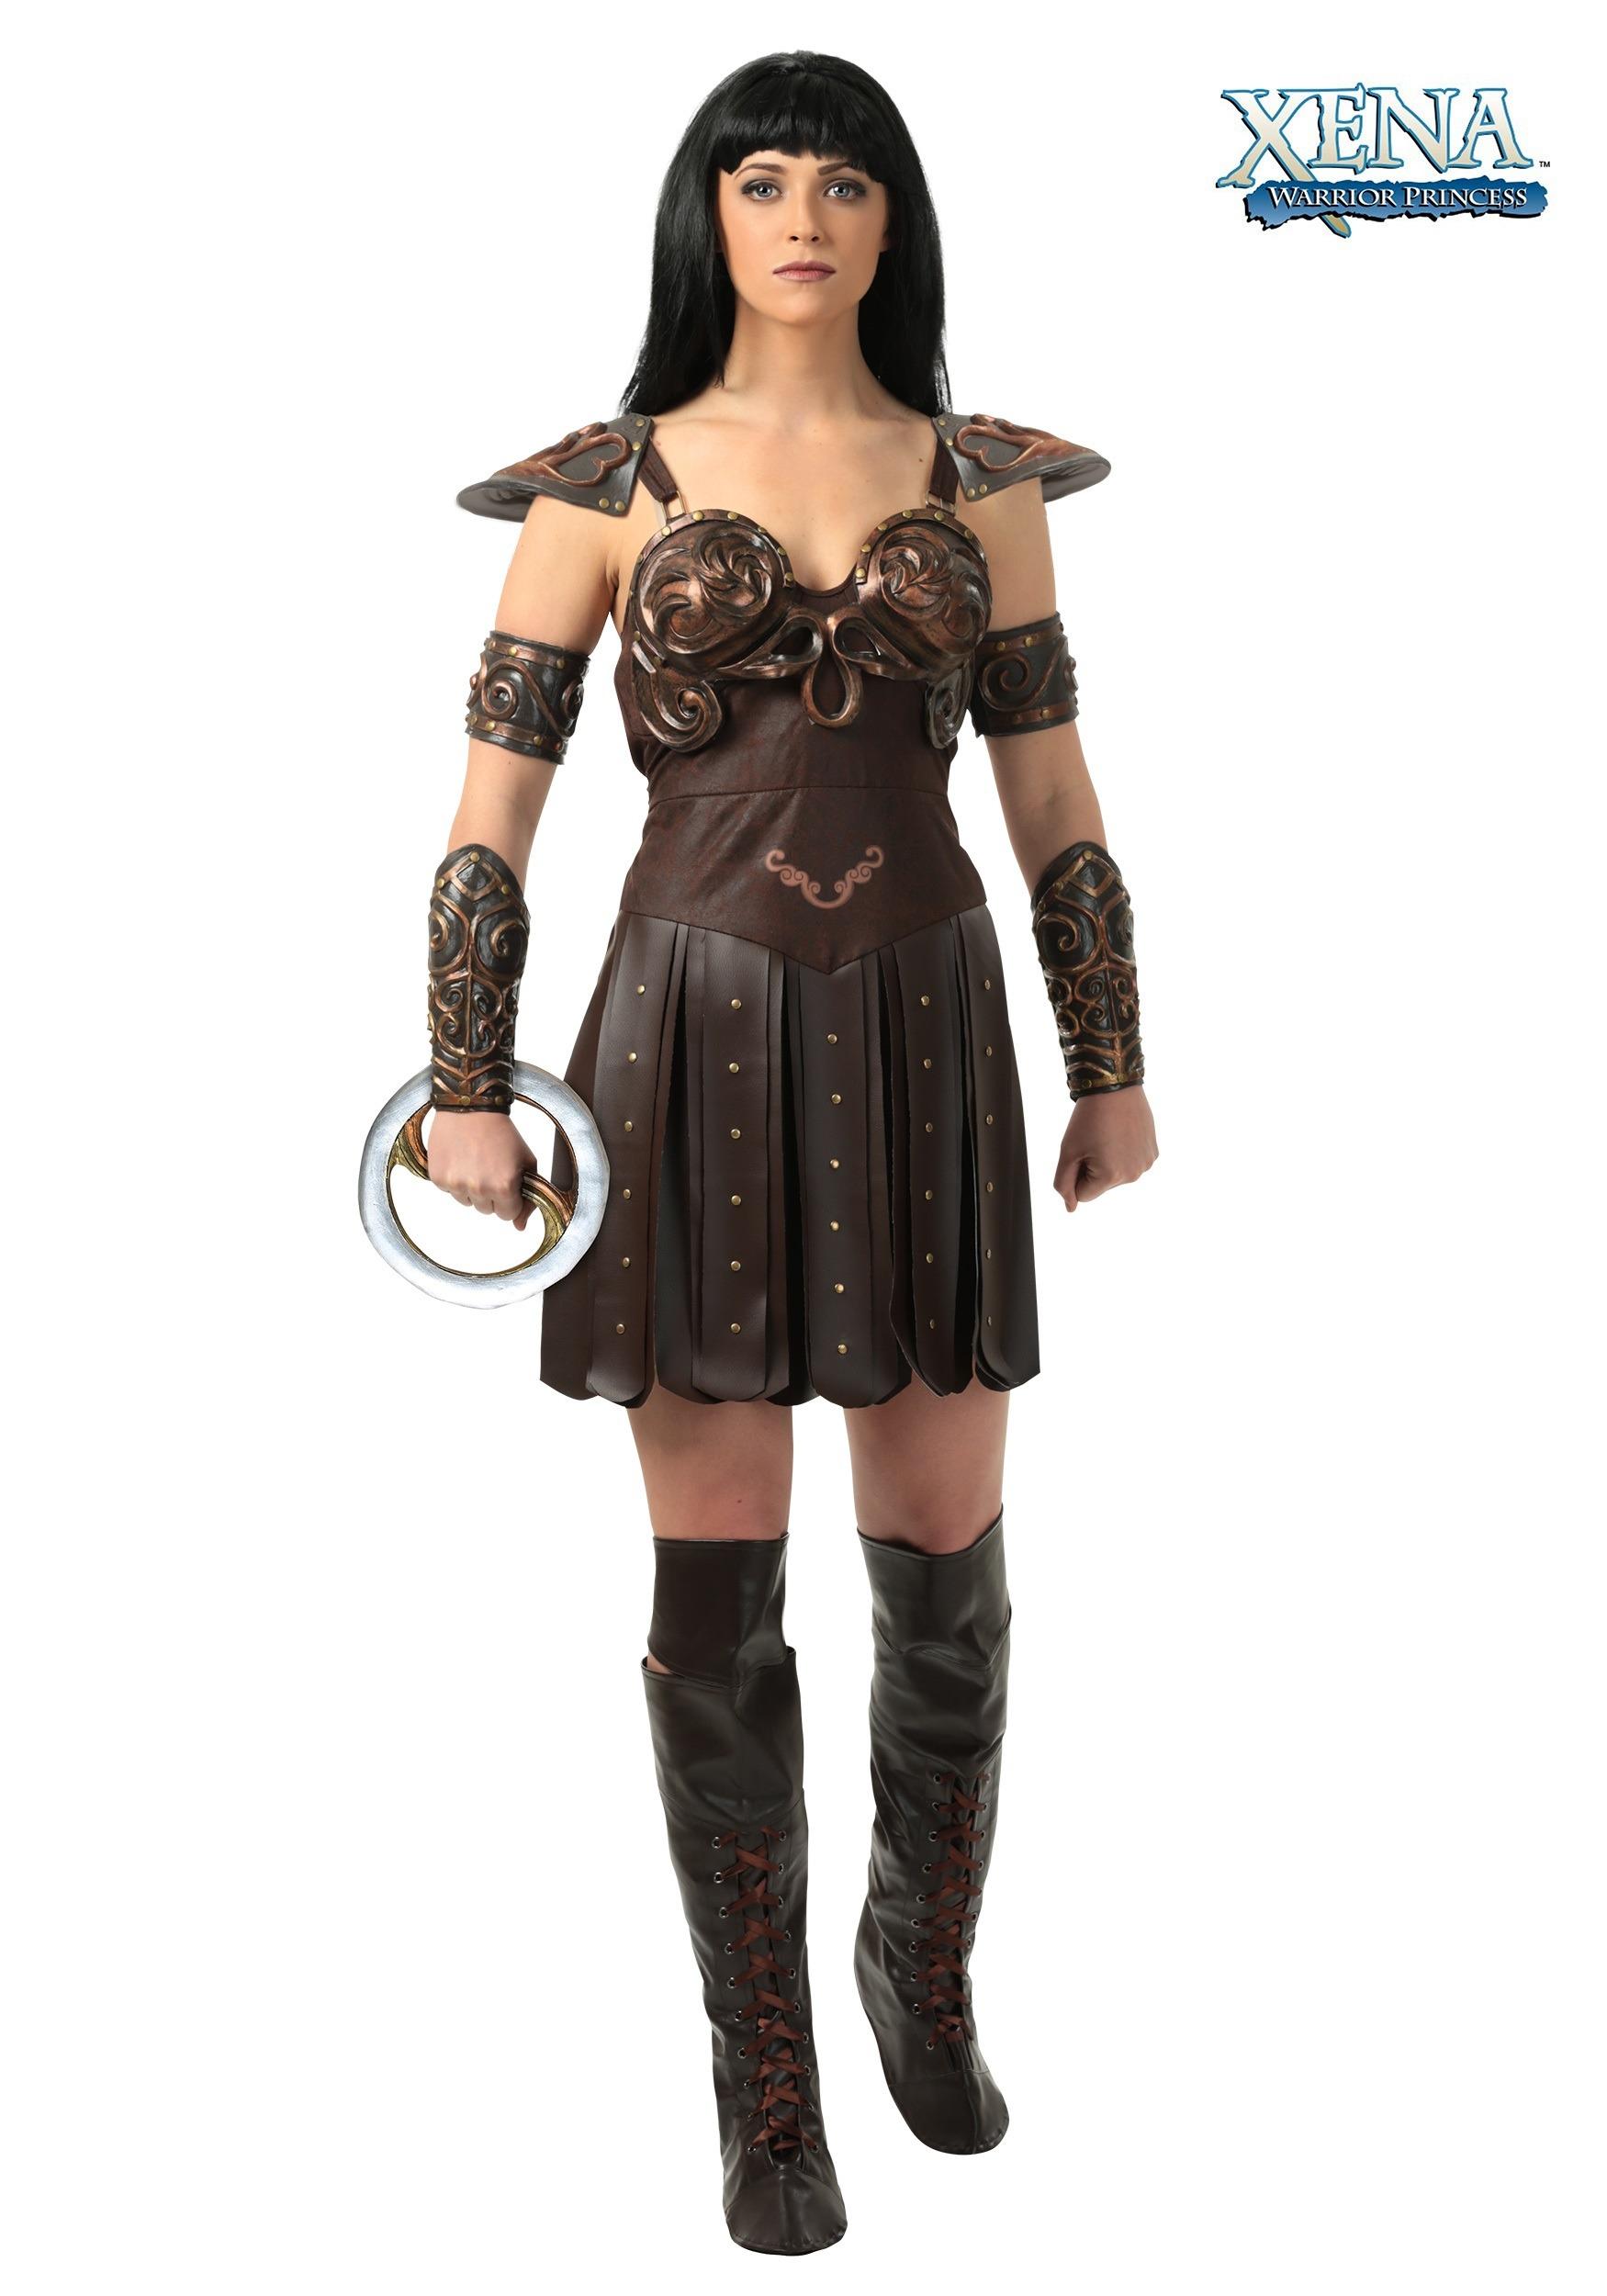 Xena Warrior Princess Costume Women's Xena Costume